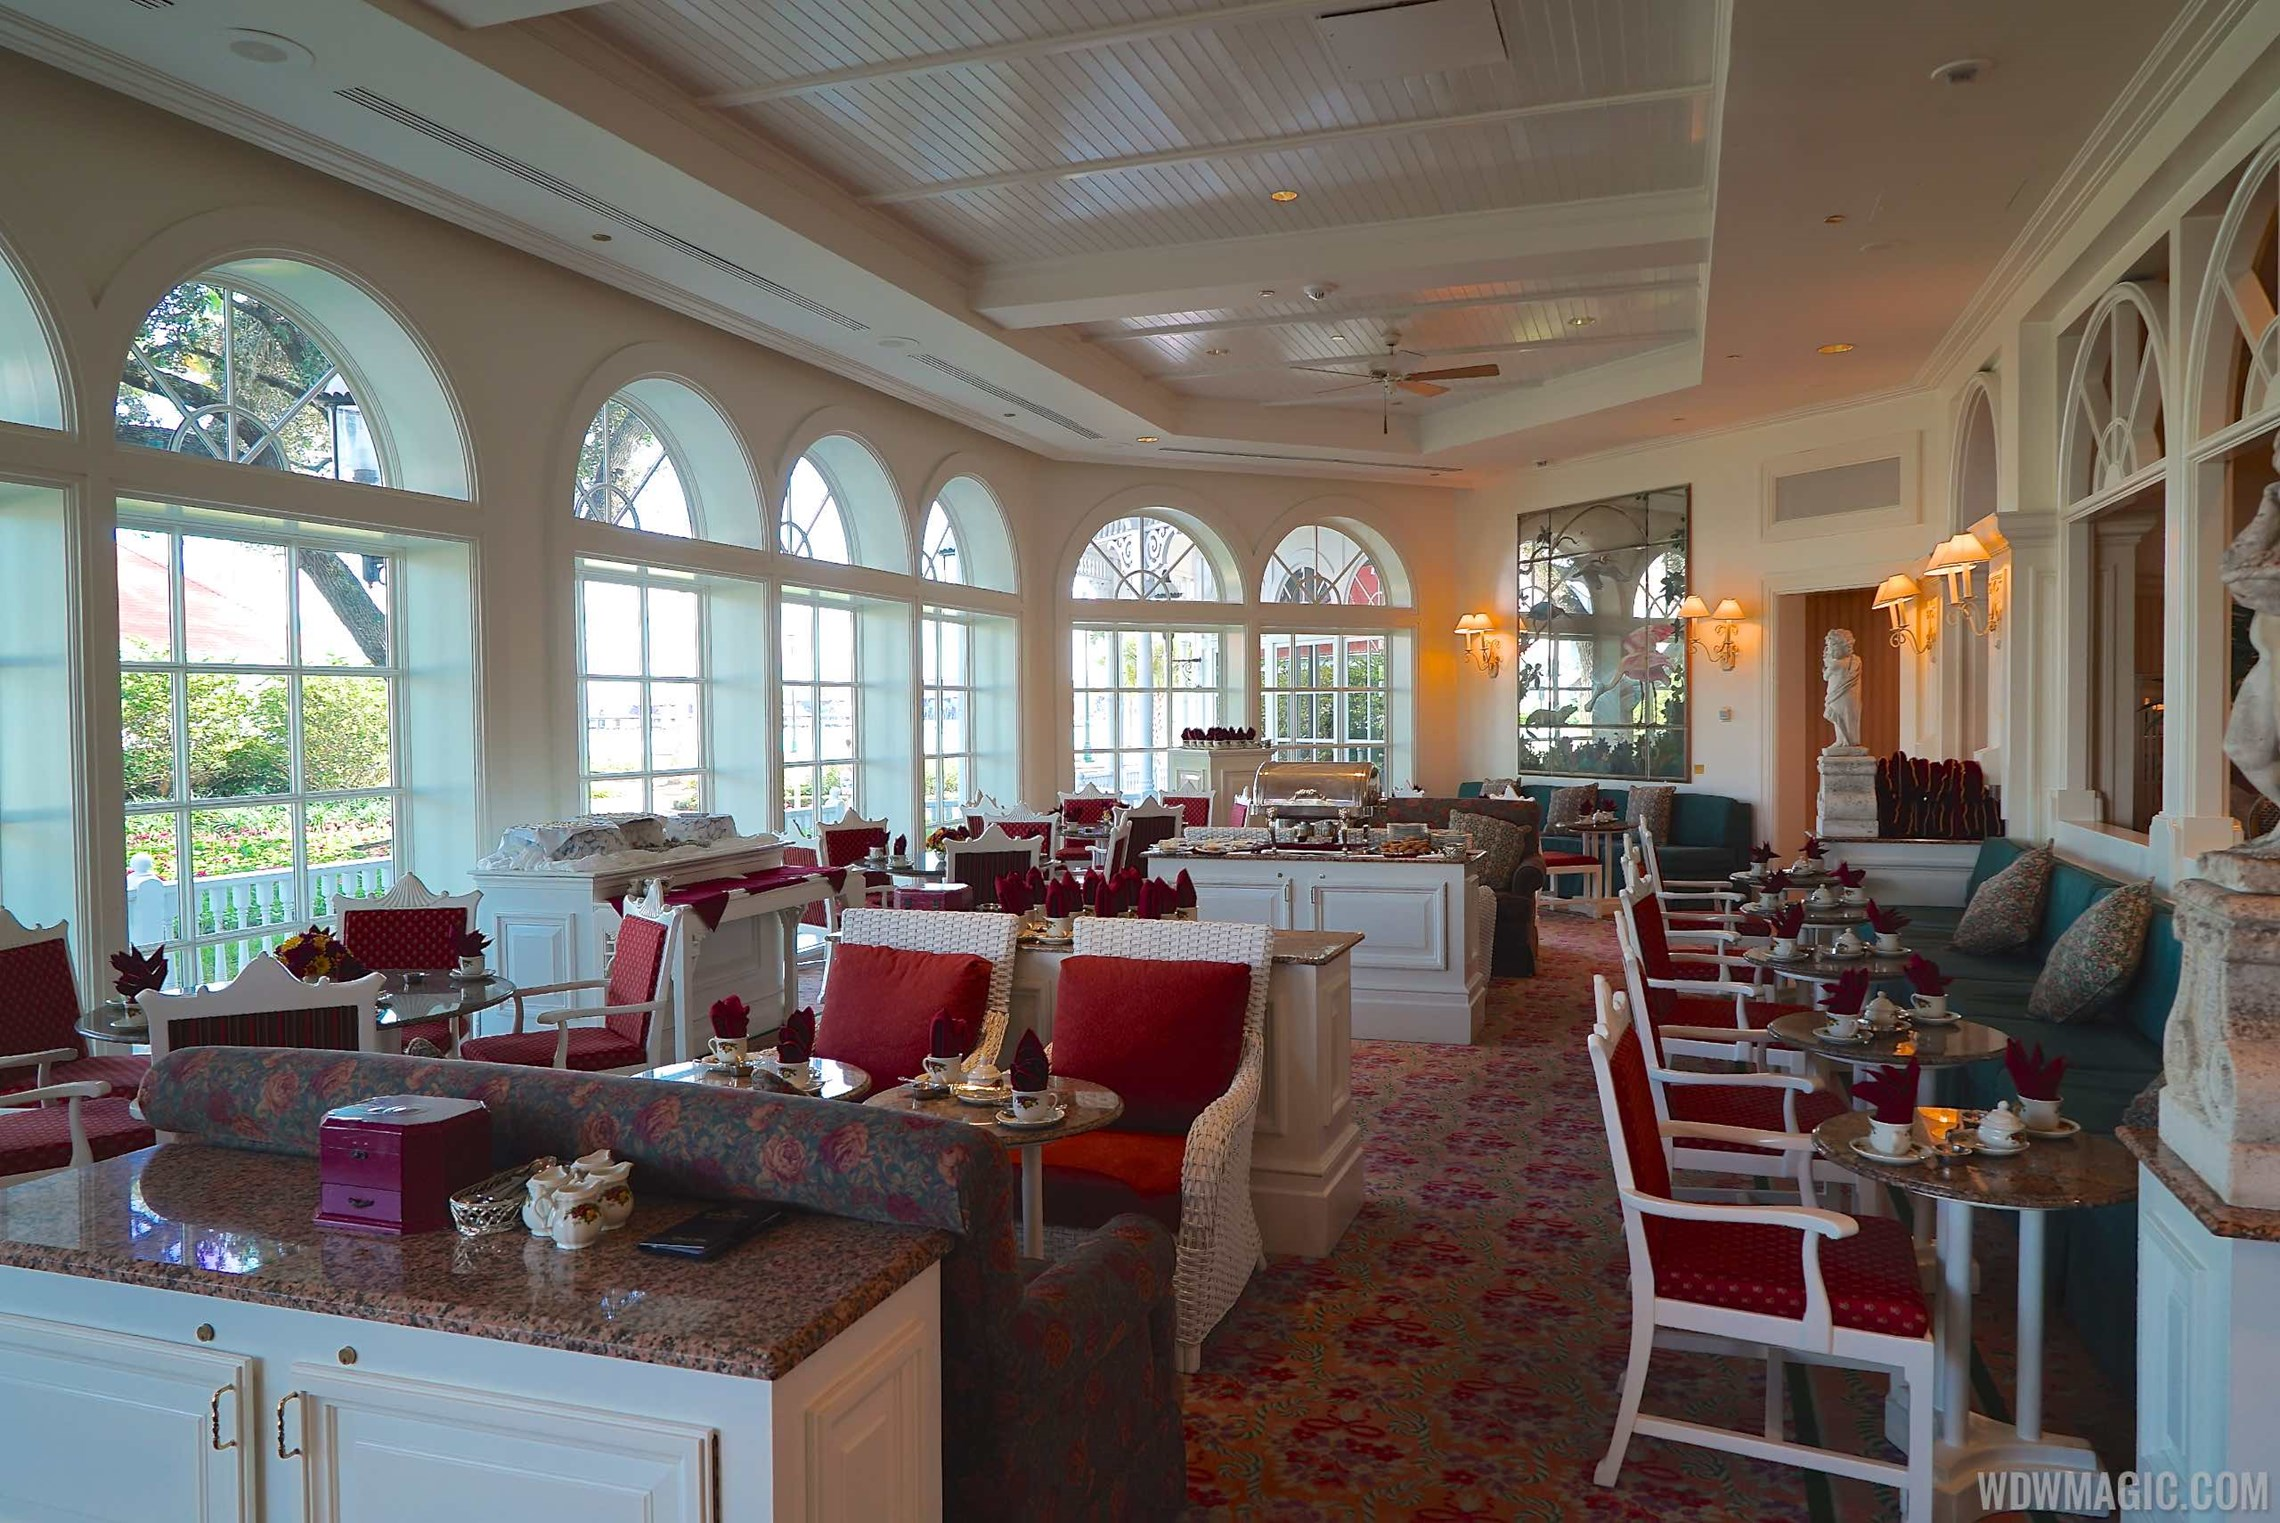 Garden View Tea Lounge overview